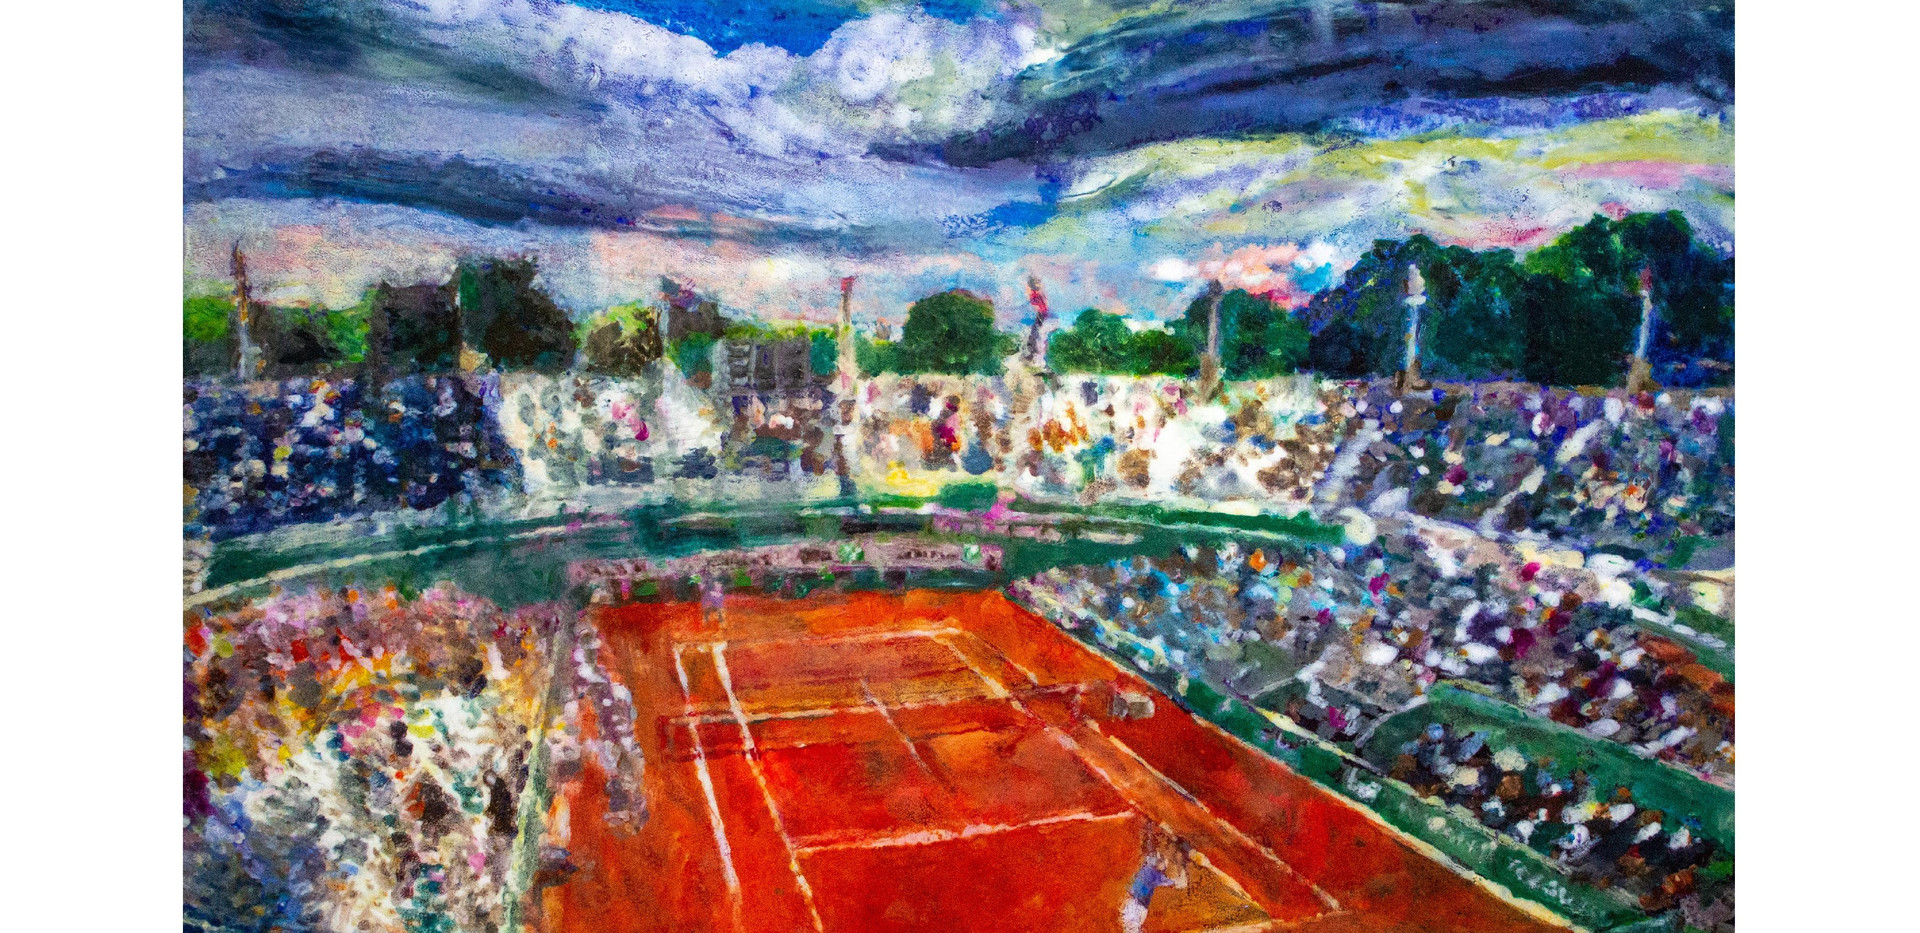 Ronald Garros